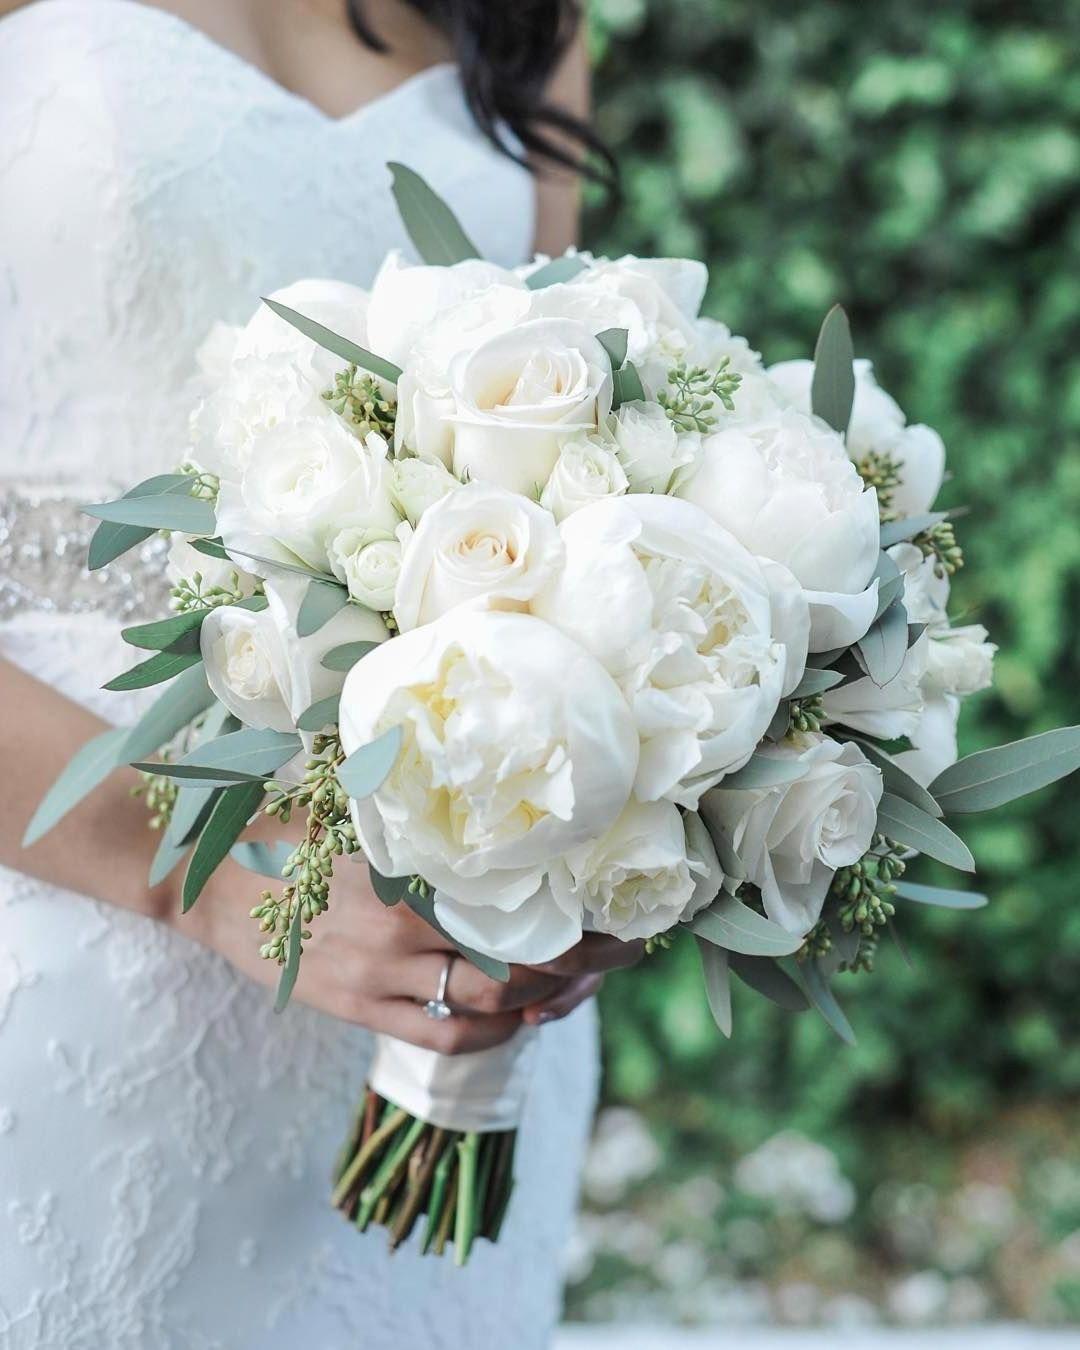 20 Elegant White and Greenery Wedding Bouquets